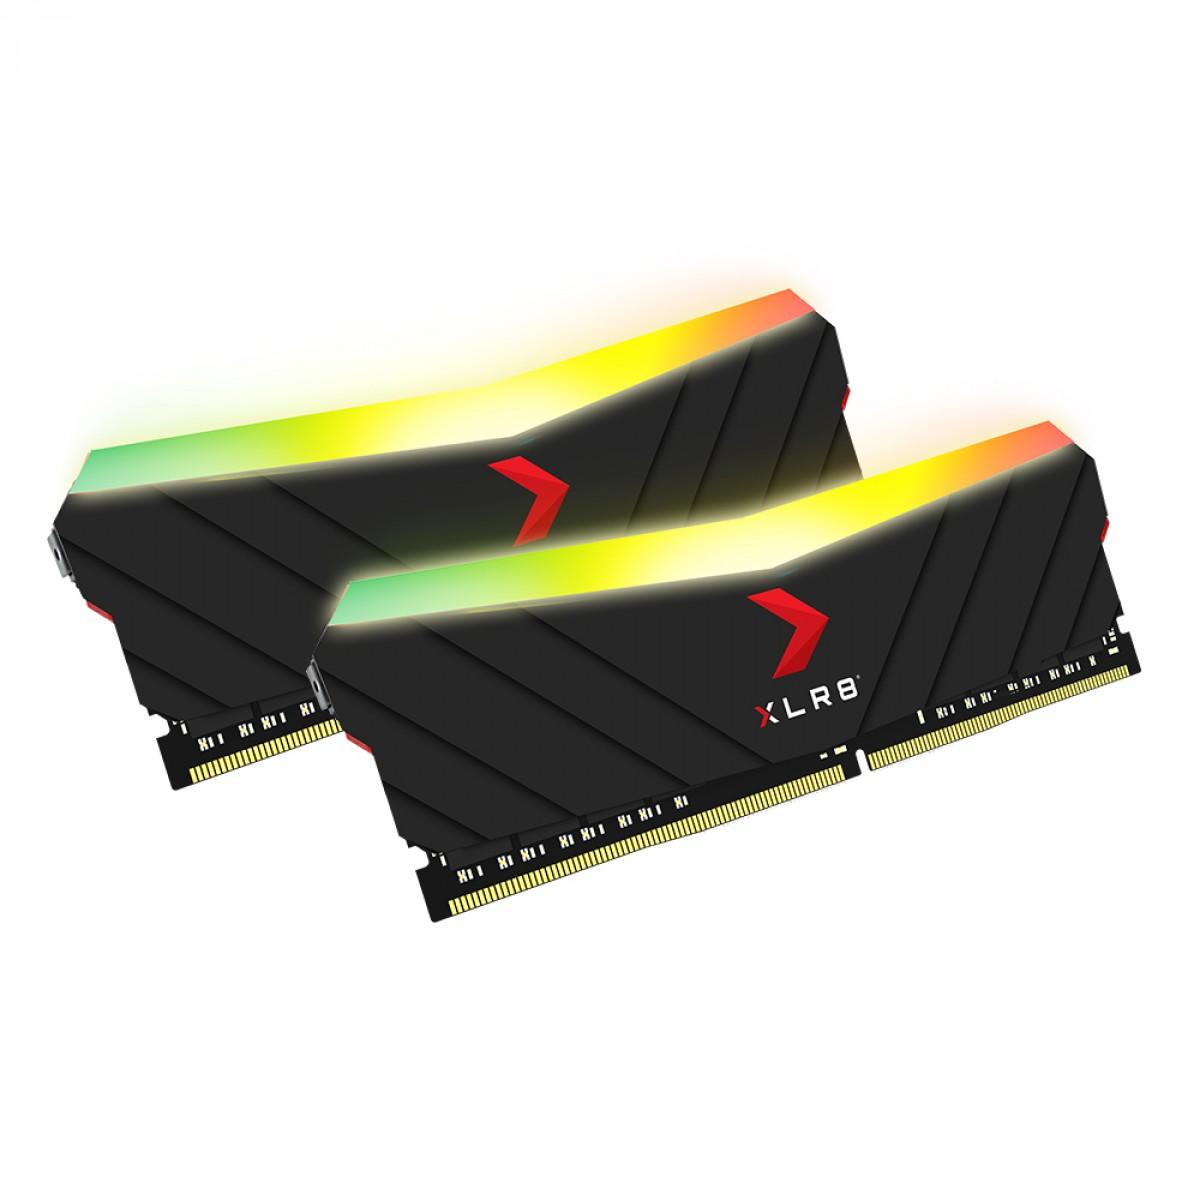 Memória DDR4 PNY XLR8 RGB Gaming, 16GB (2x8GB), 3600MHZ, MD16GK2D4360016XRGB